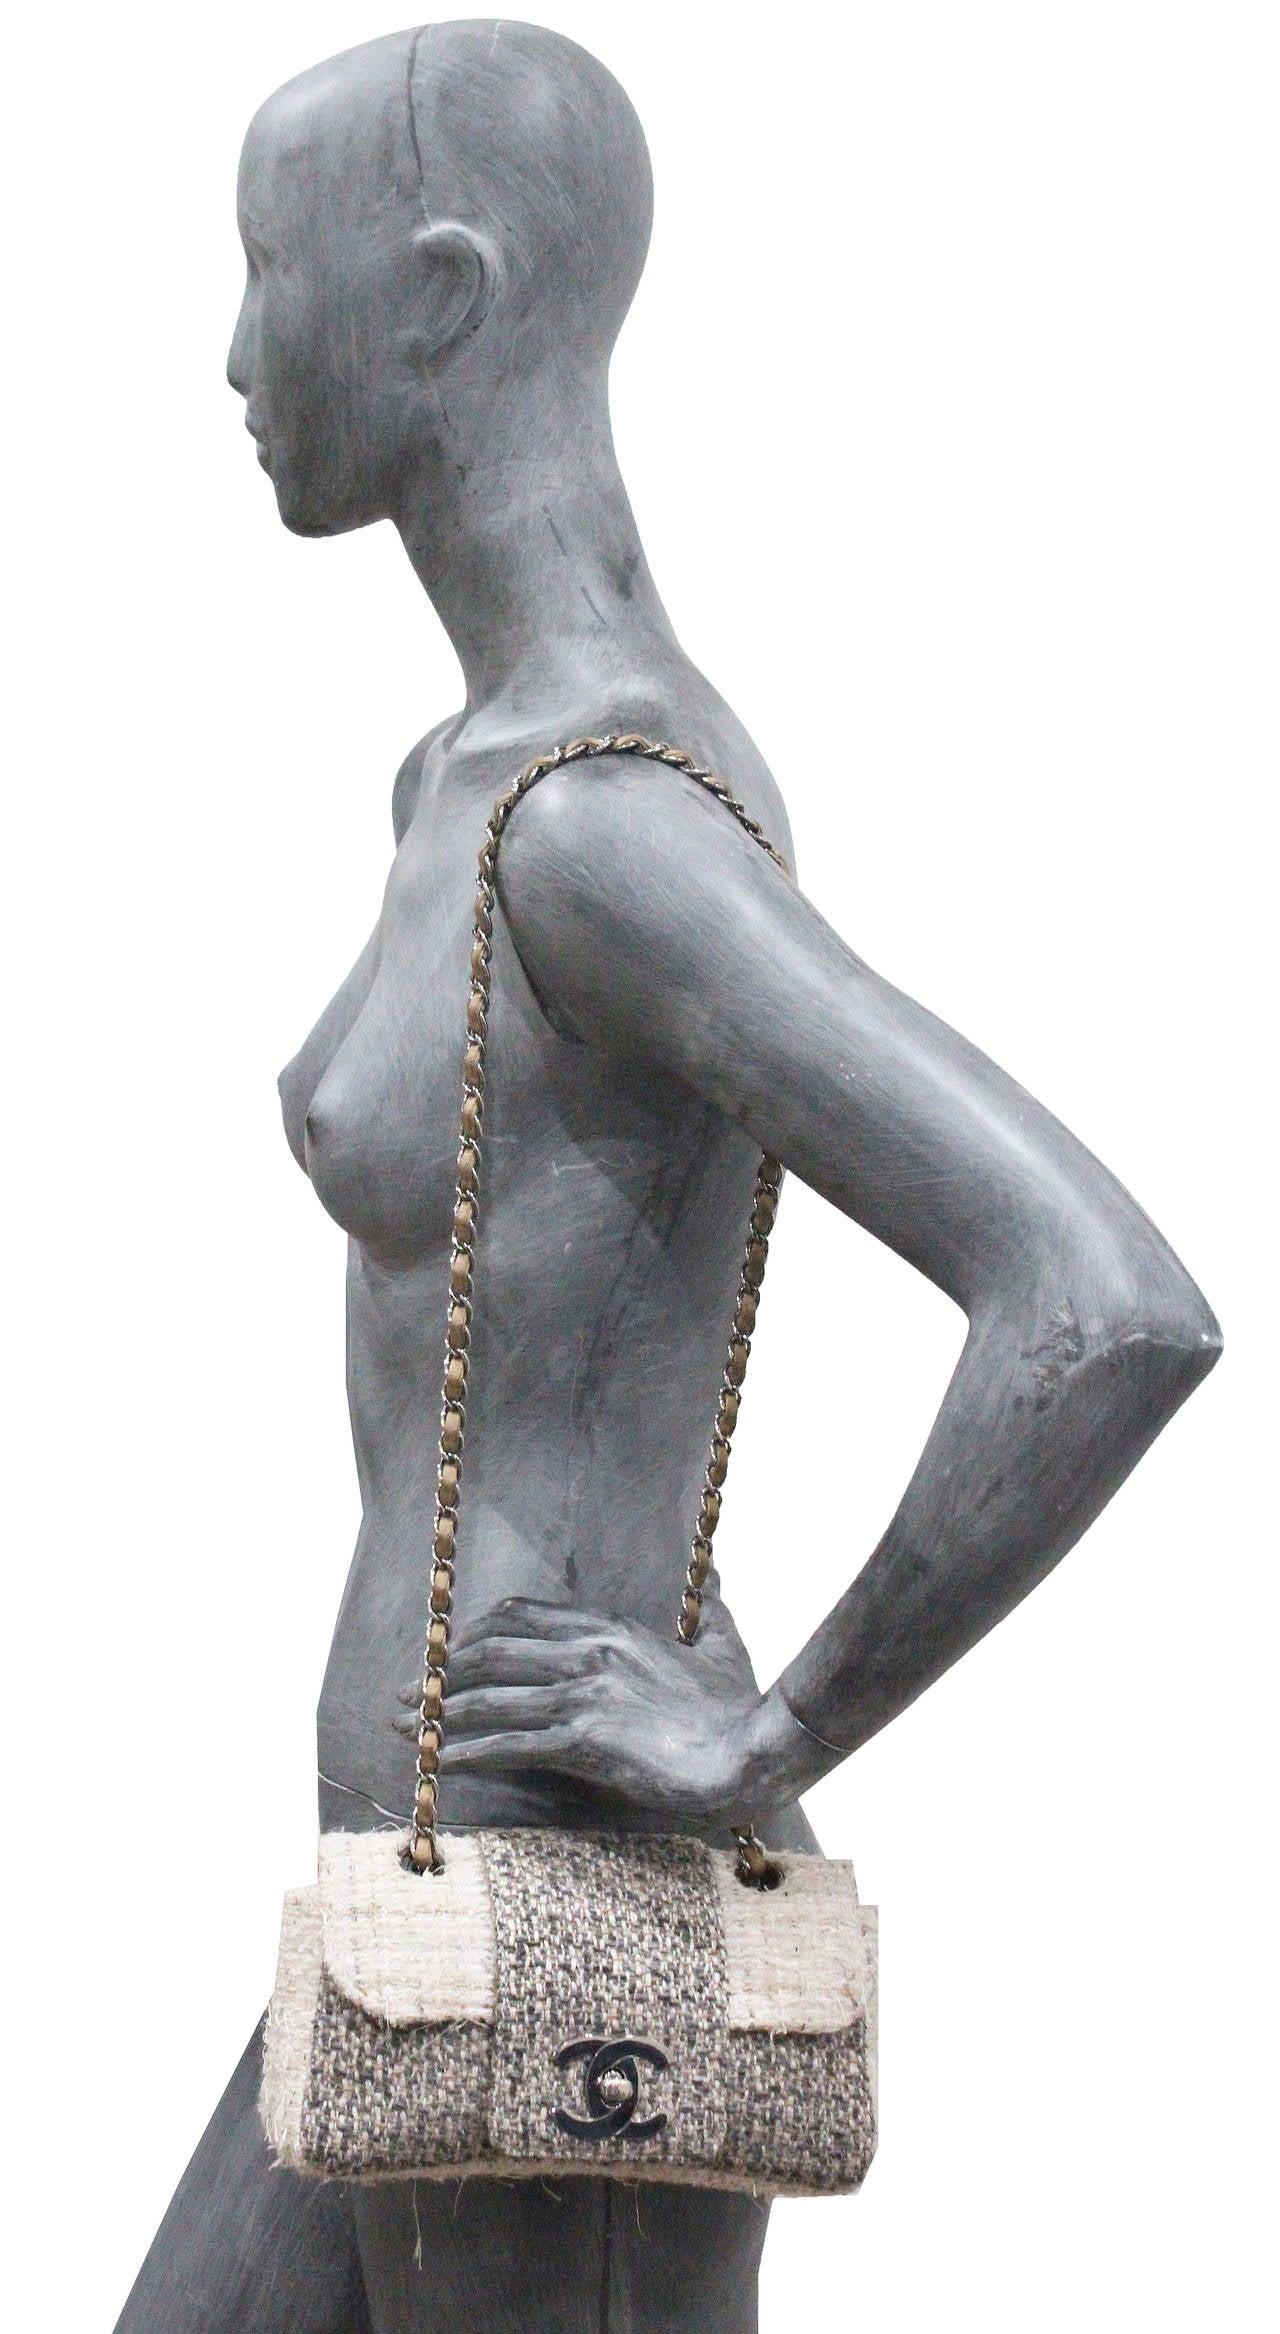 Chanel Fantasy Tweed Flap Bag 2